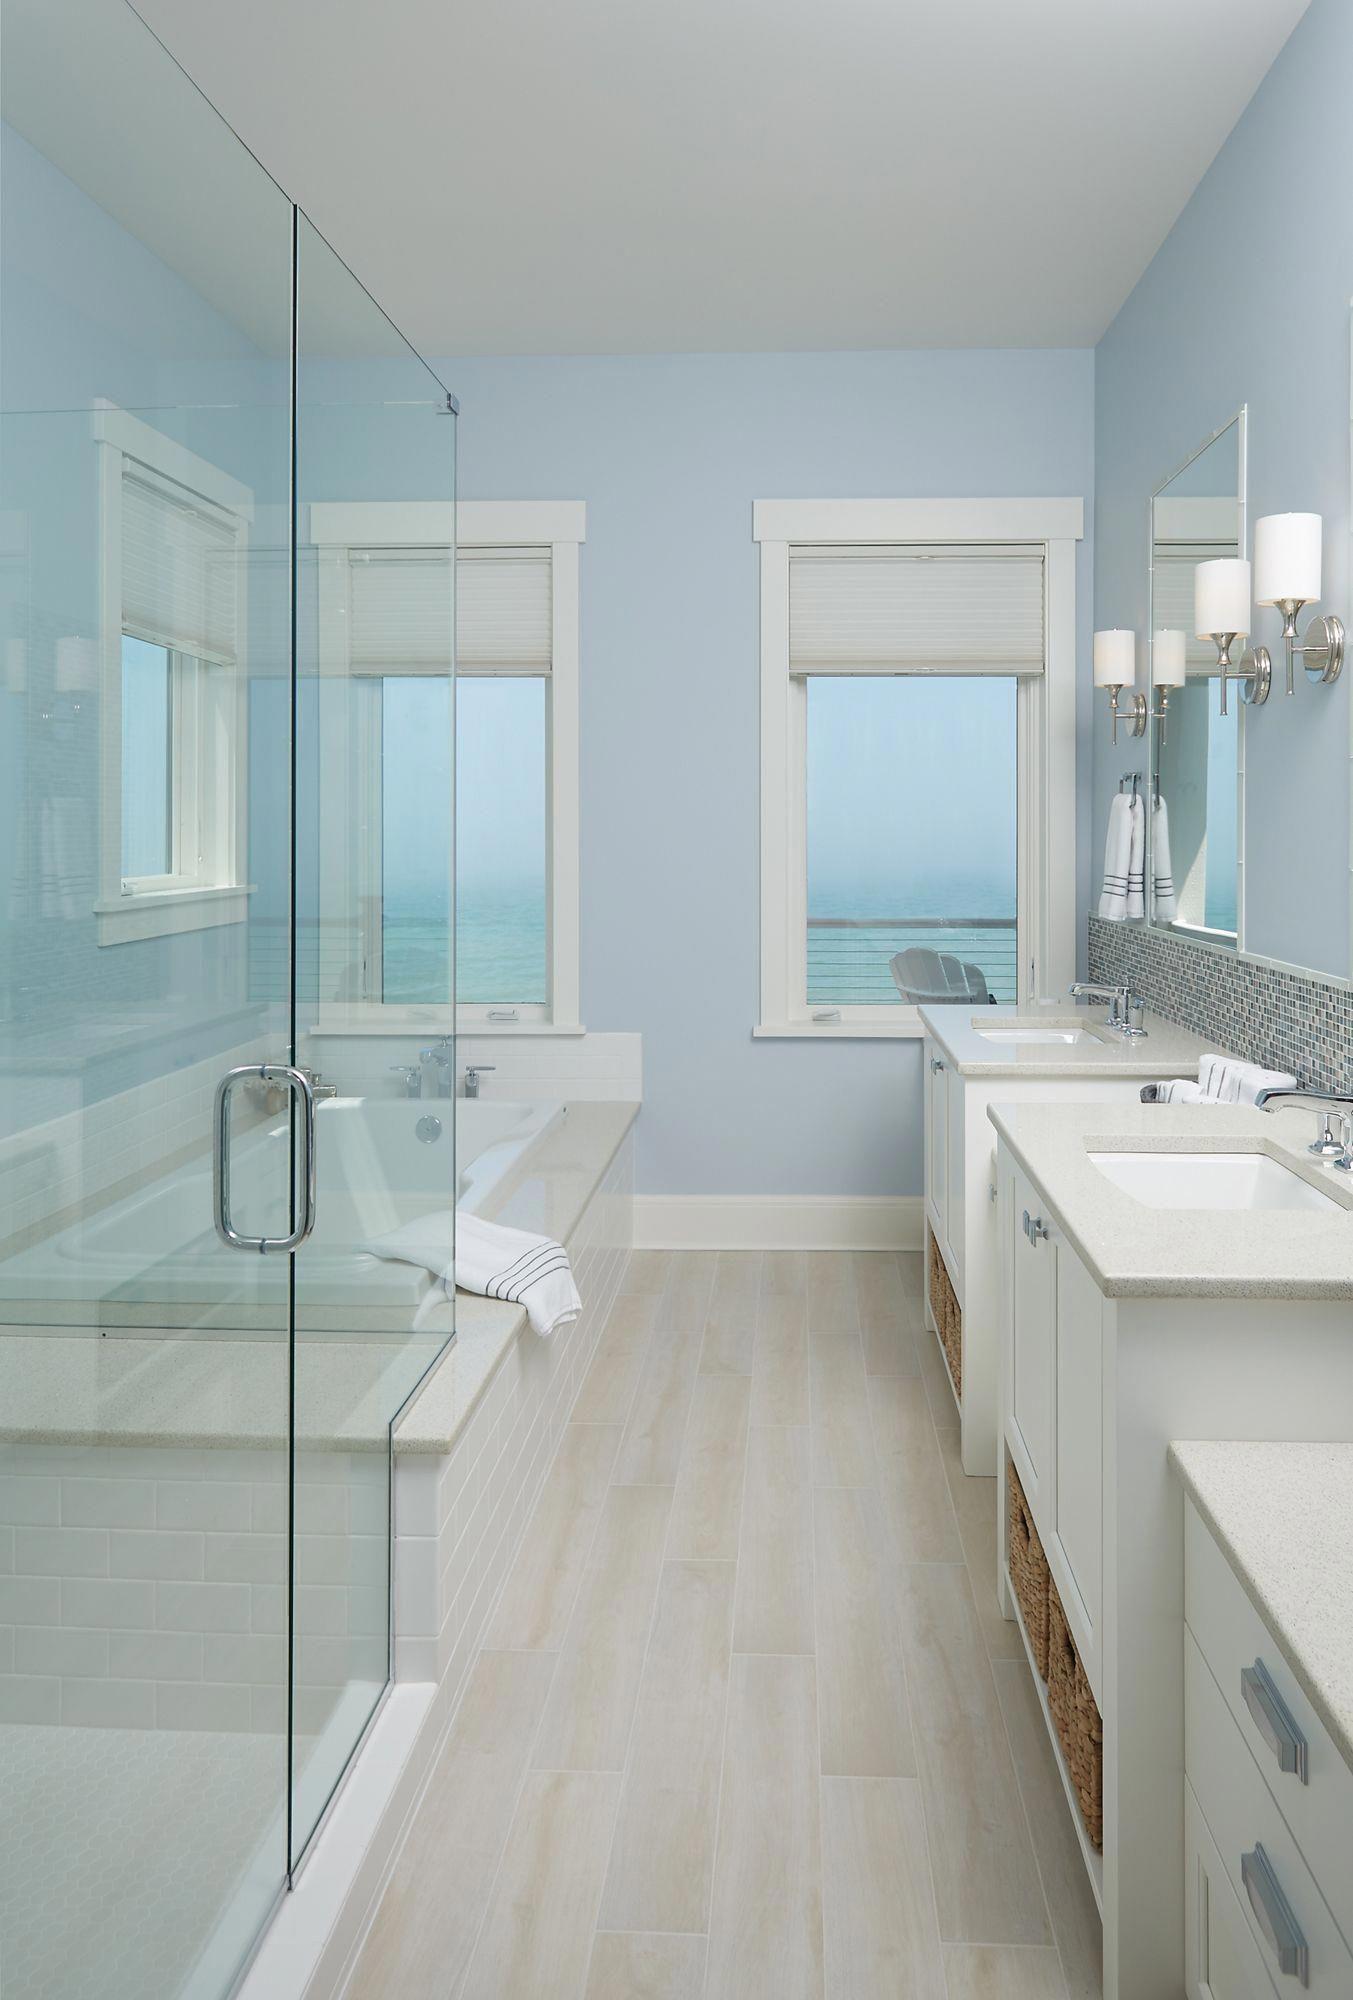 Home Decorators Collection Naples   Coastal bathroom ...